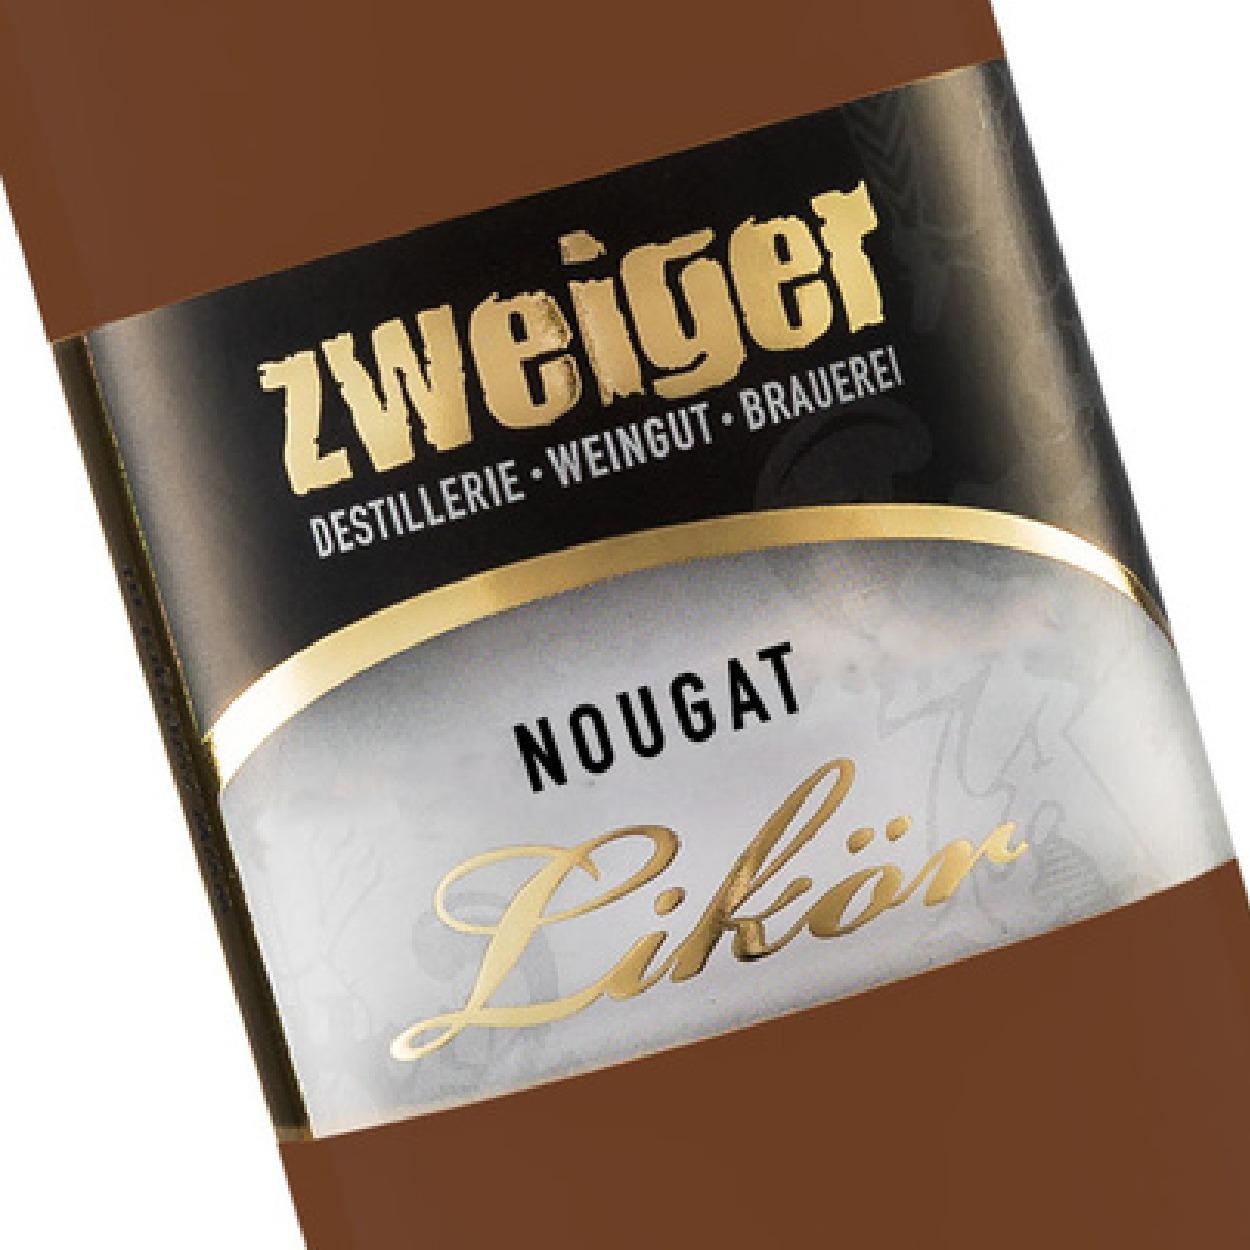 Nougat Cremelikör Zweiger Destillerie